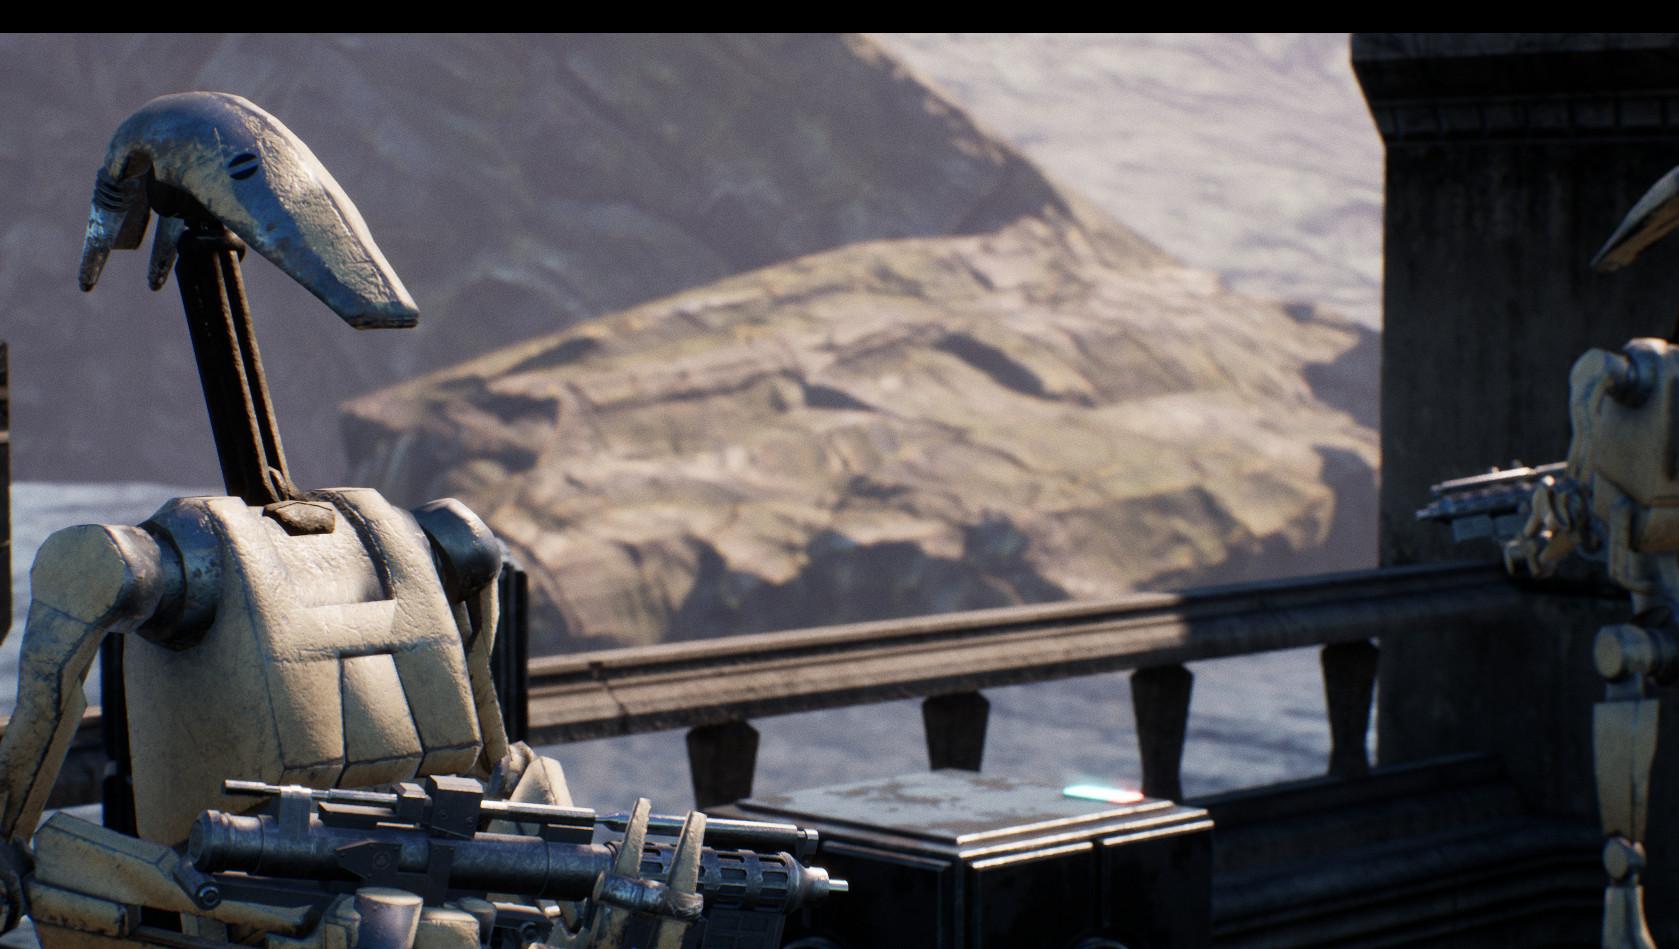 ArtStation - Unreal Engine 4 Star Wars Assets, Owain Bramwell